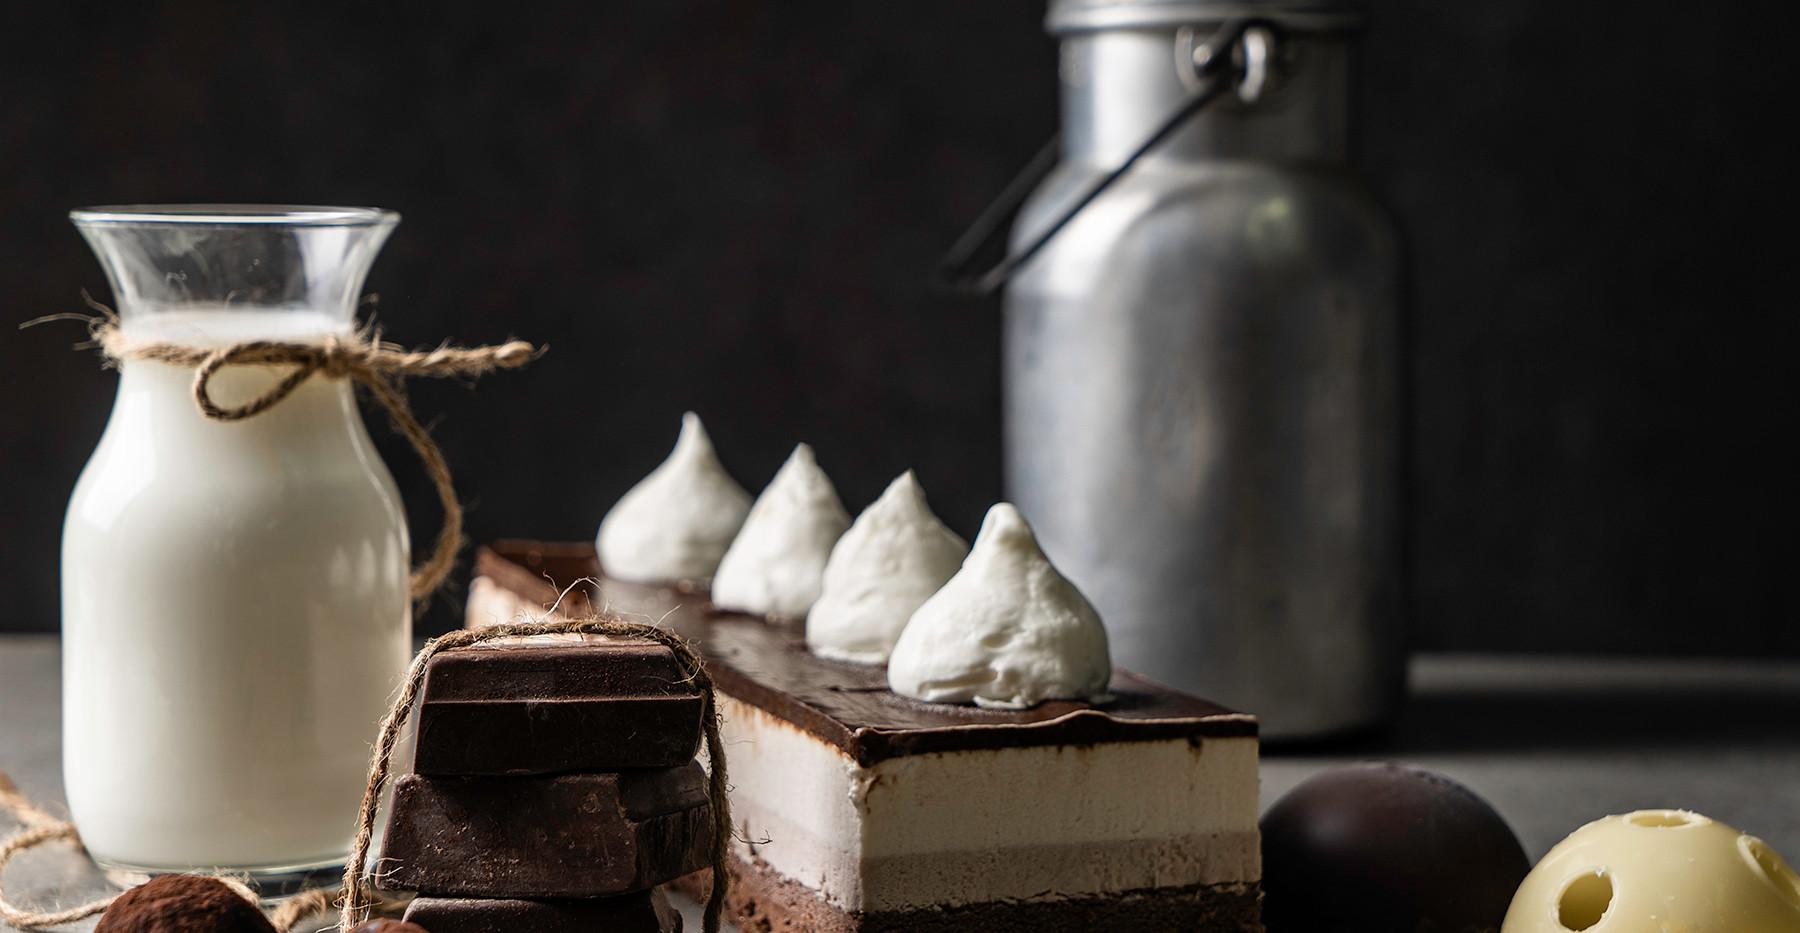 Three chocolates